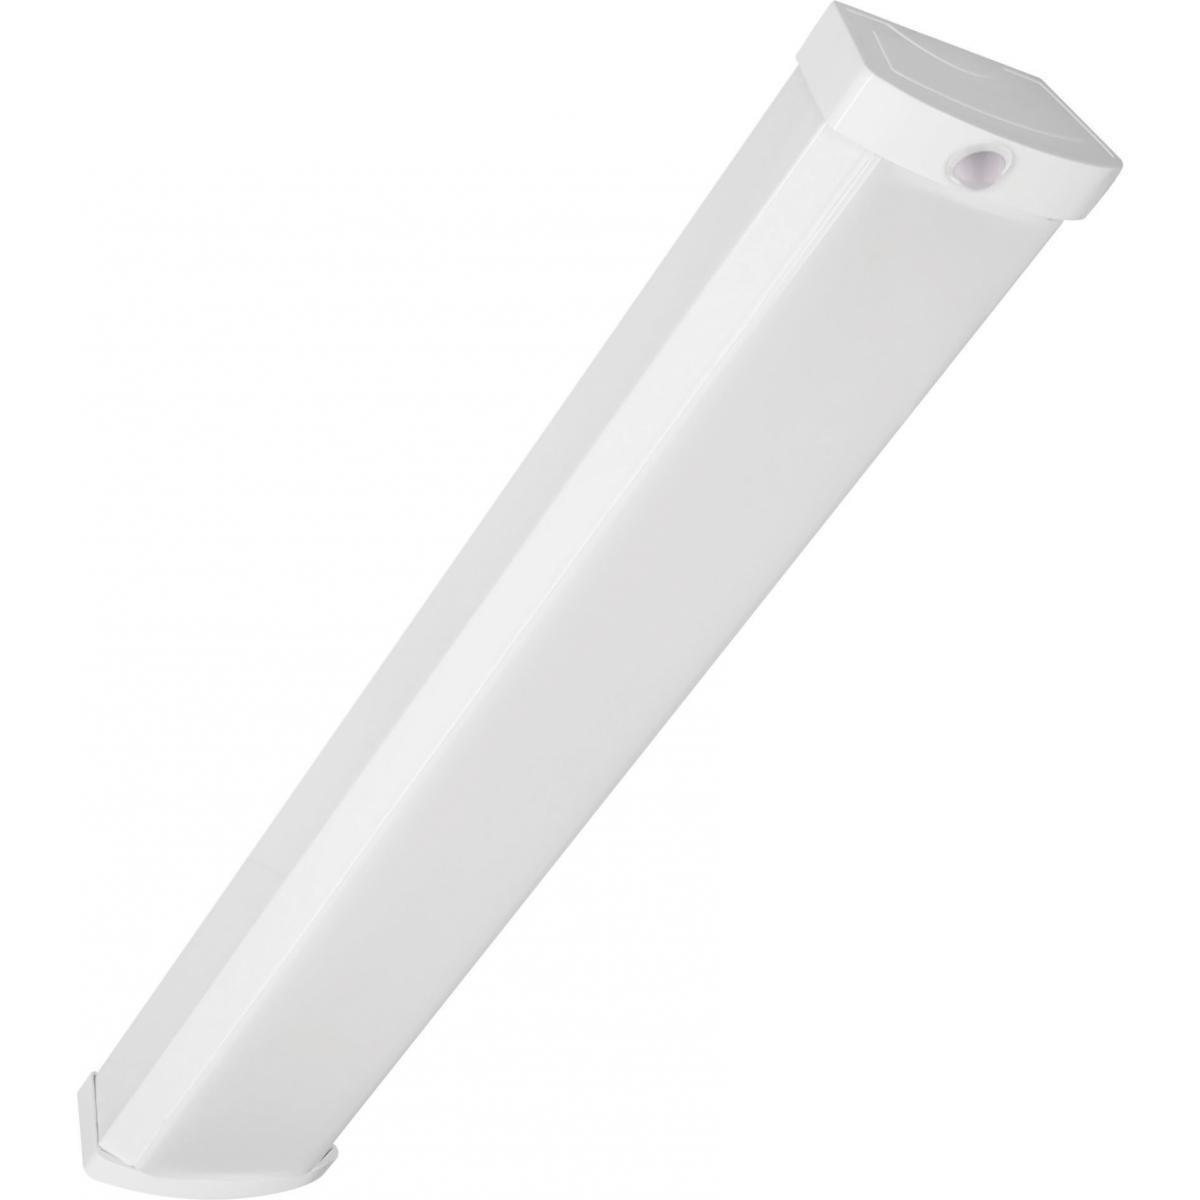 65-1097 2FT LED CEILING WRAP